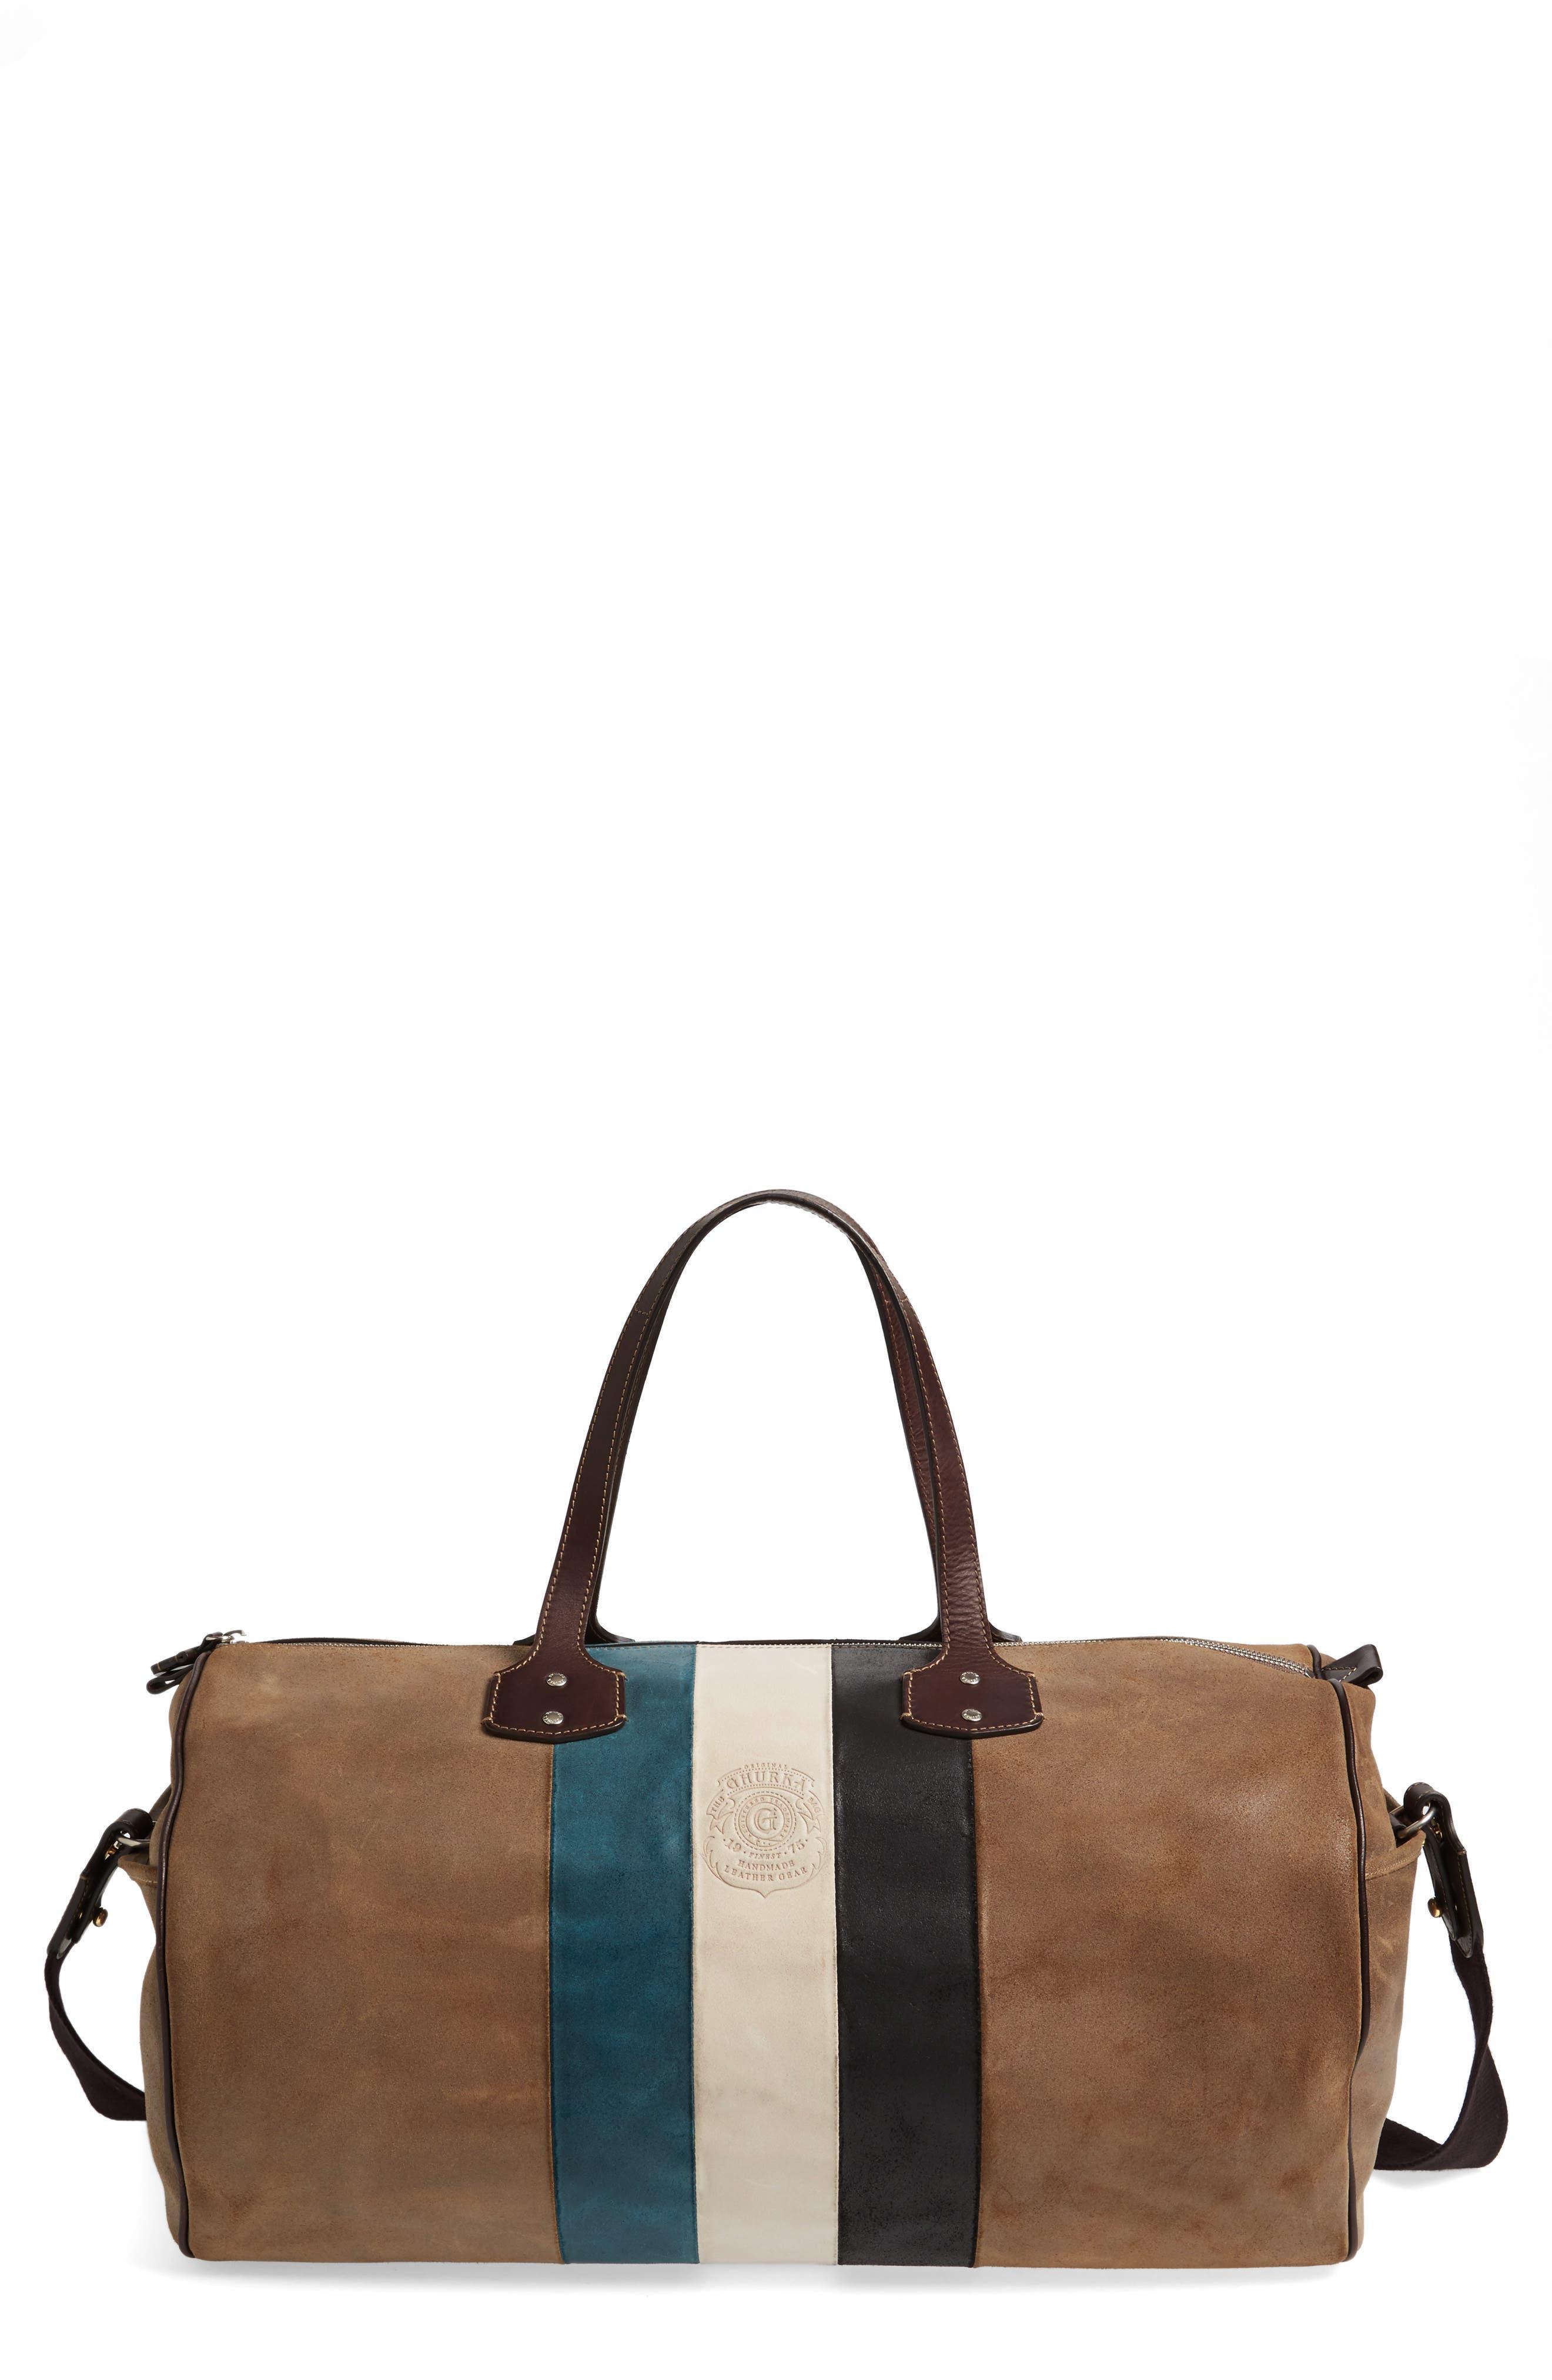 Grove Stripe Leather Duffel Bag,                             Main thumbnail 1, color,                             250